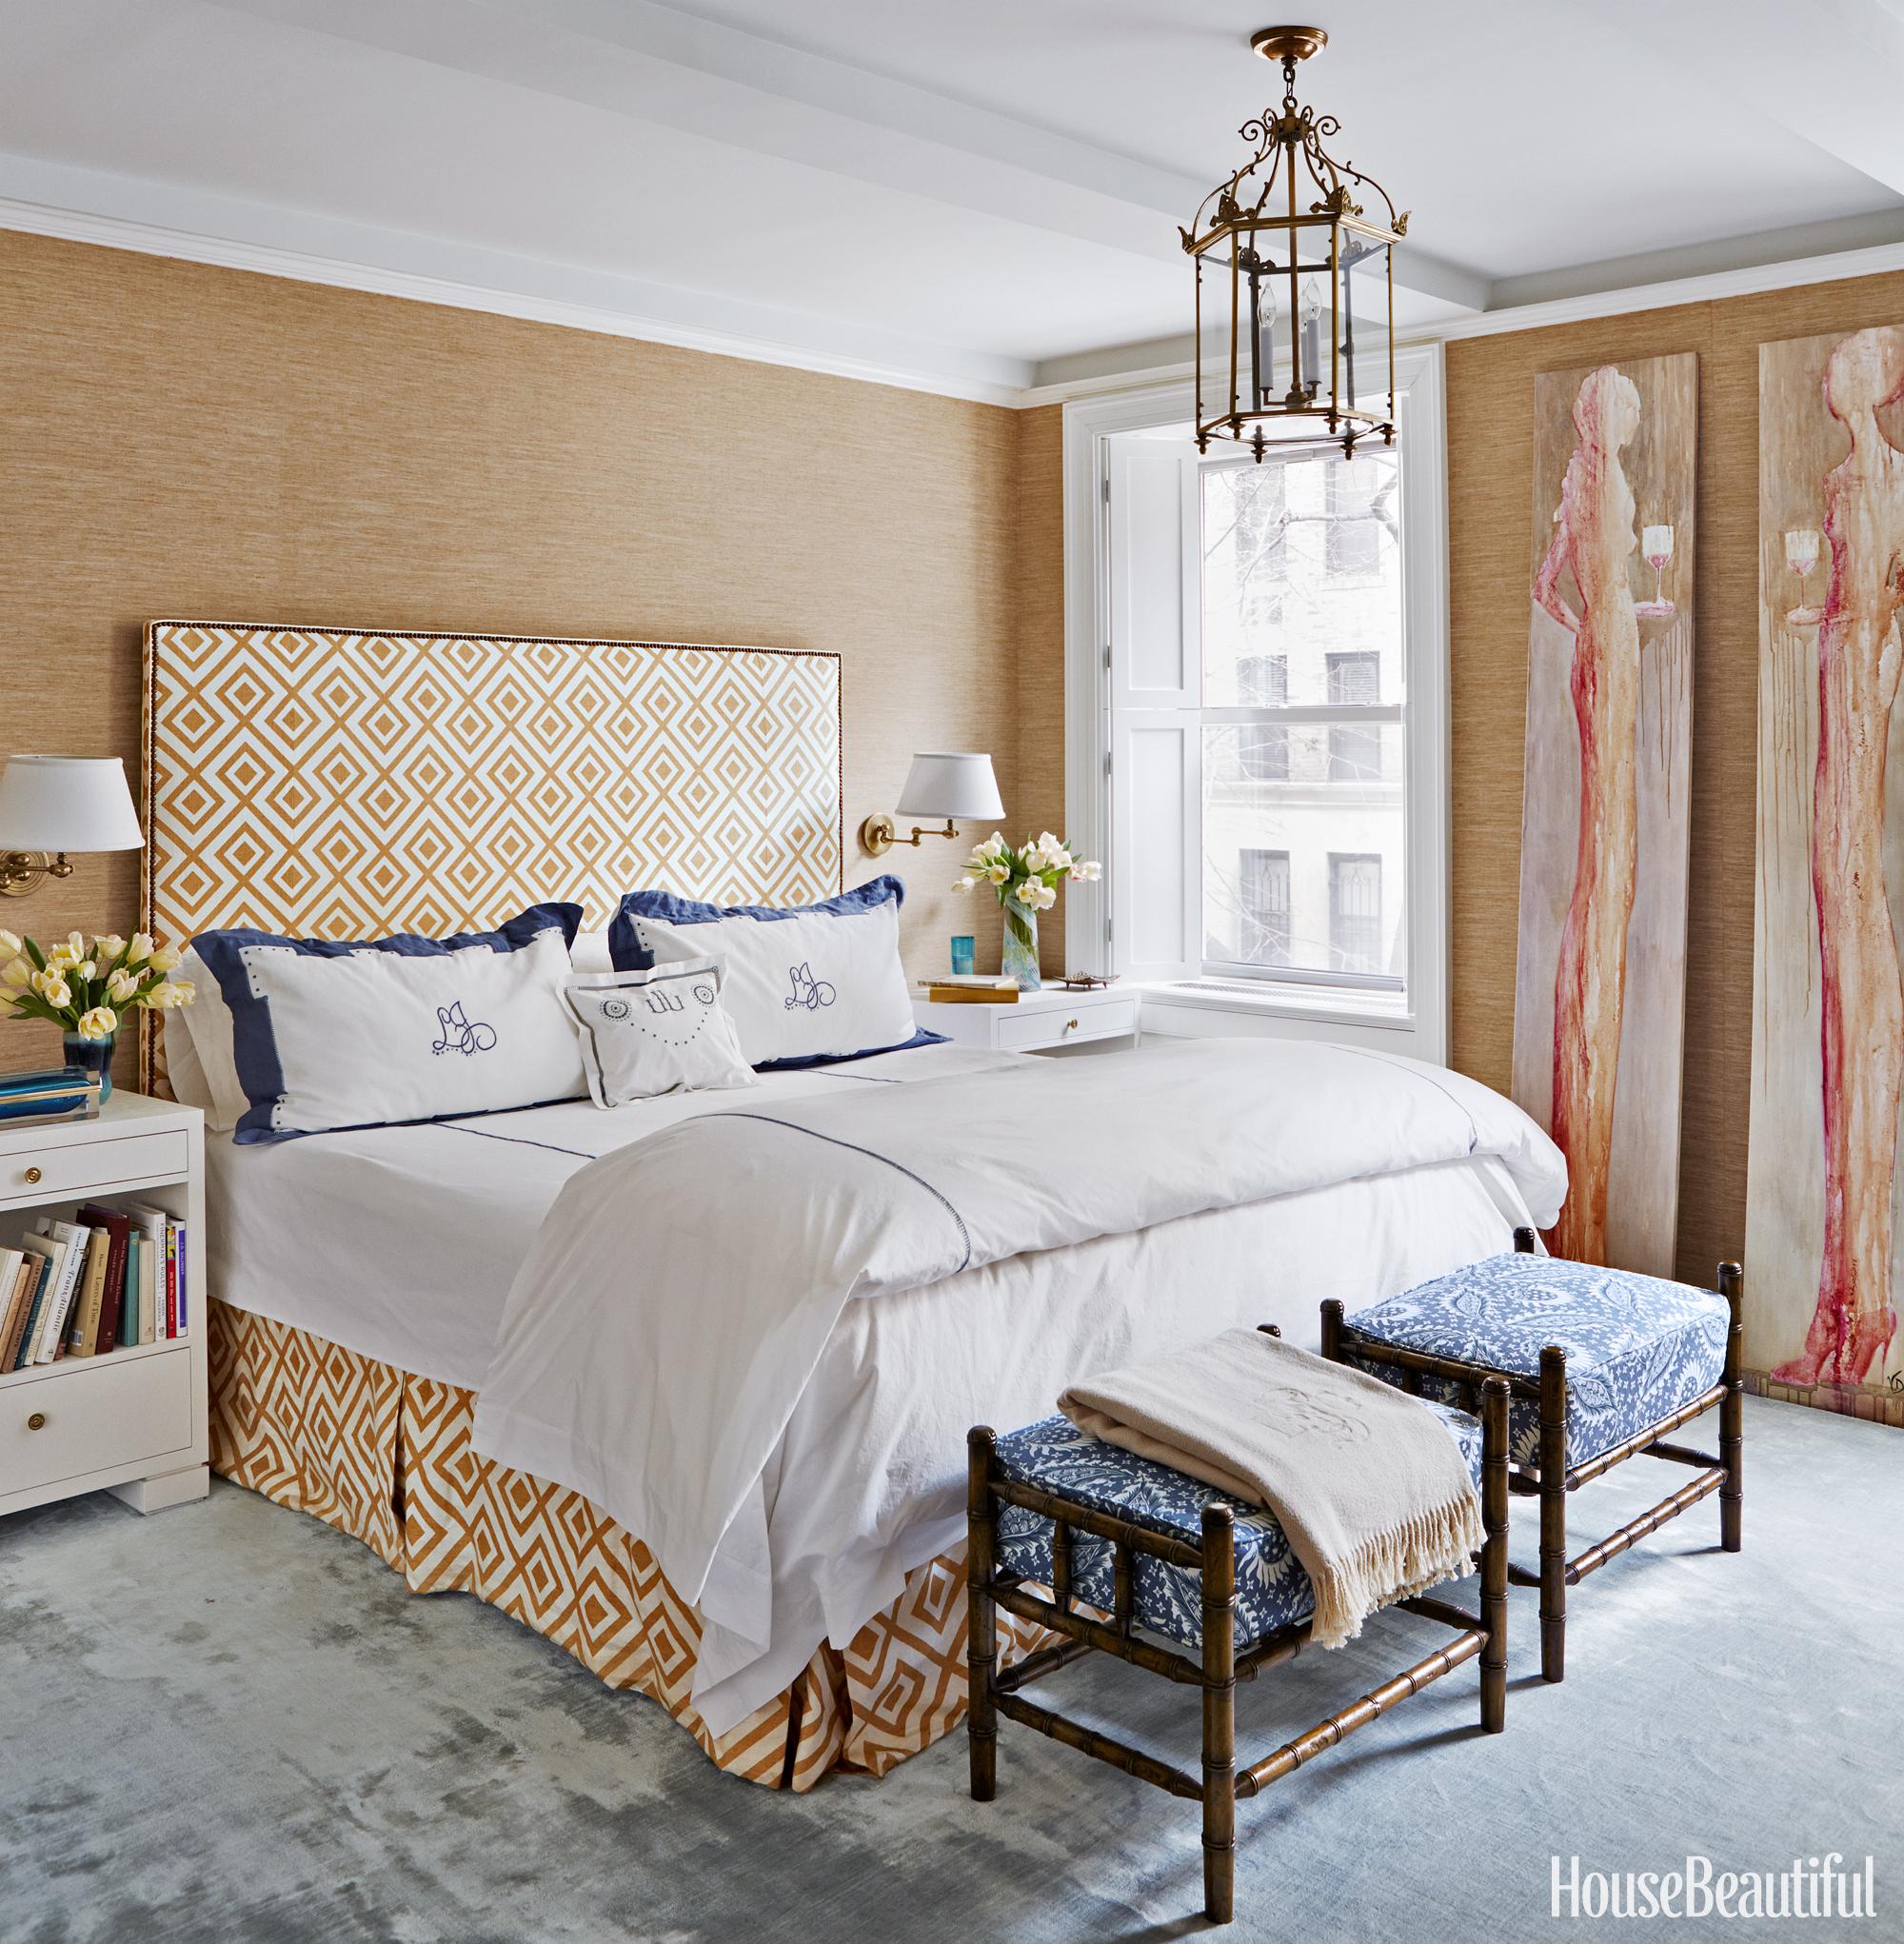 Decorating bedrooms www.clickbratislava.com/wp-content/uploads/2017/12 ... EOGKVTC